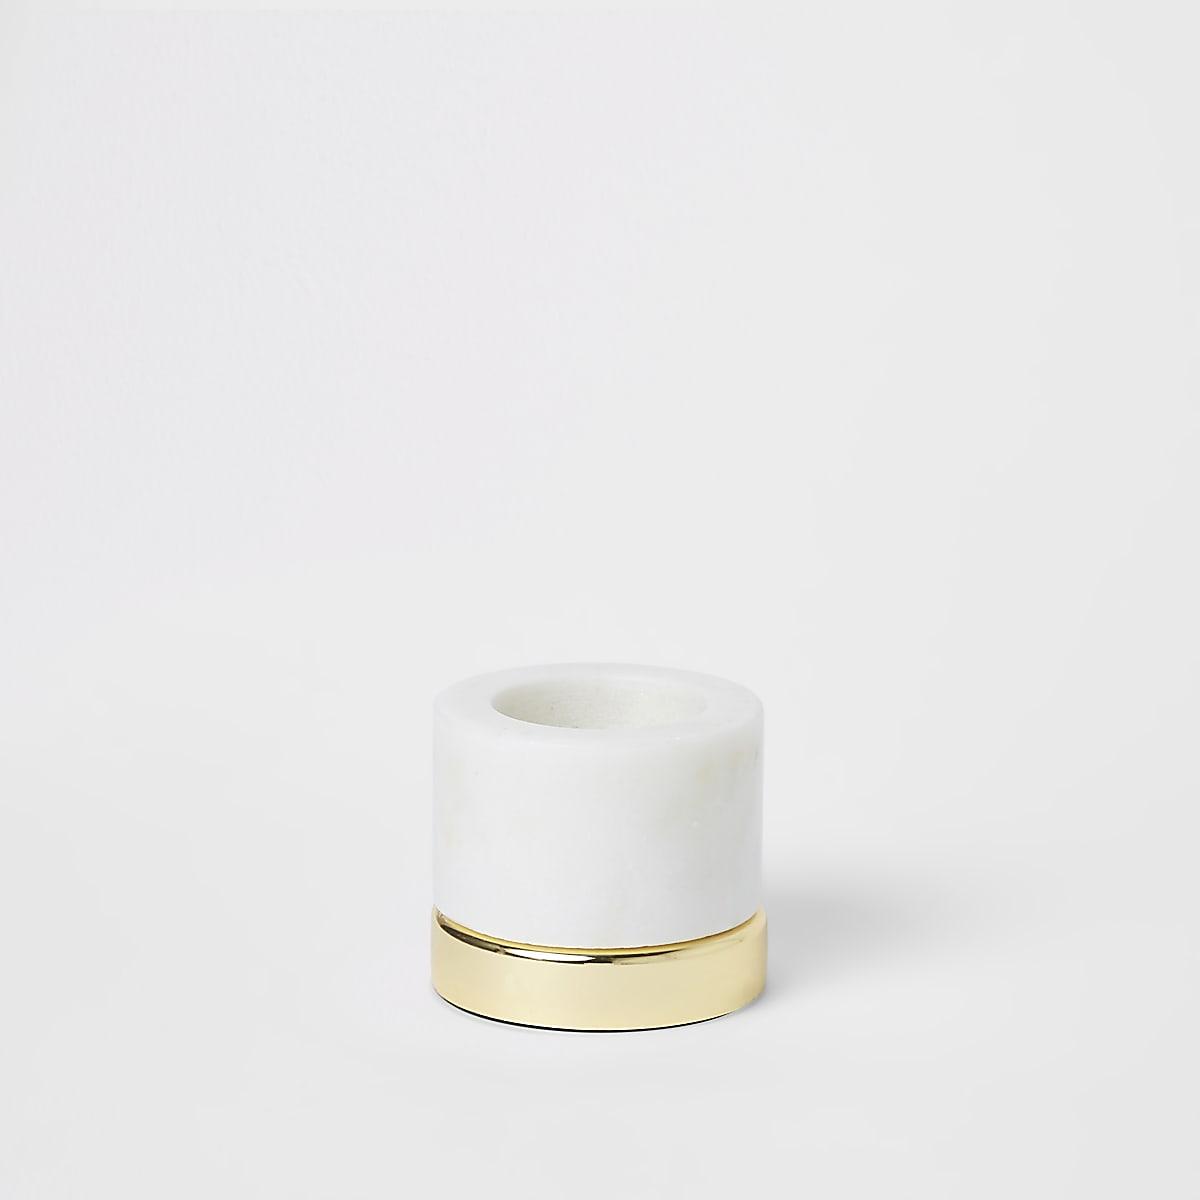 Petit bougeoir chauffe-plat en marbre à base en métal